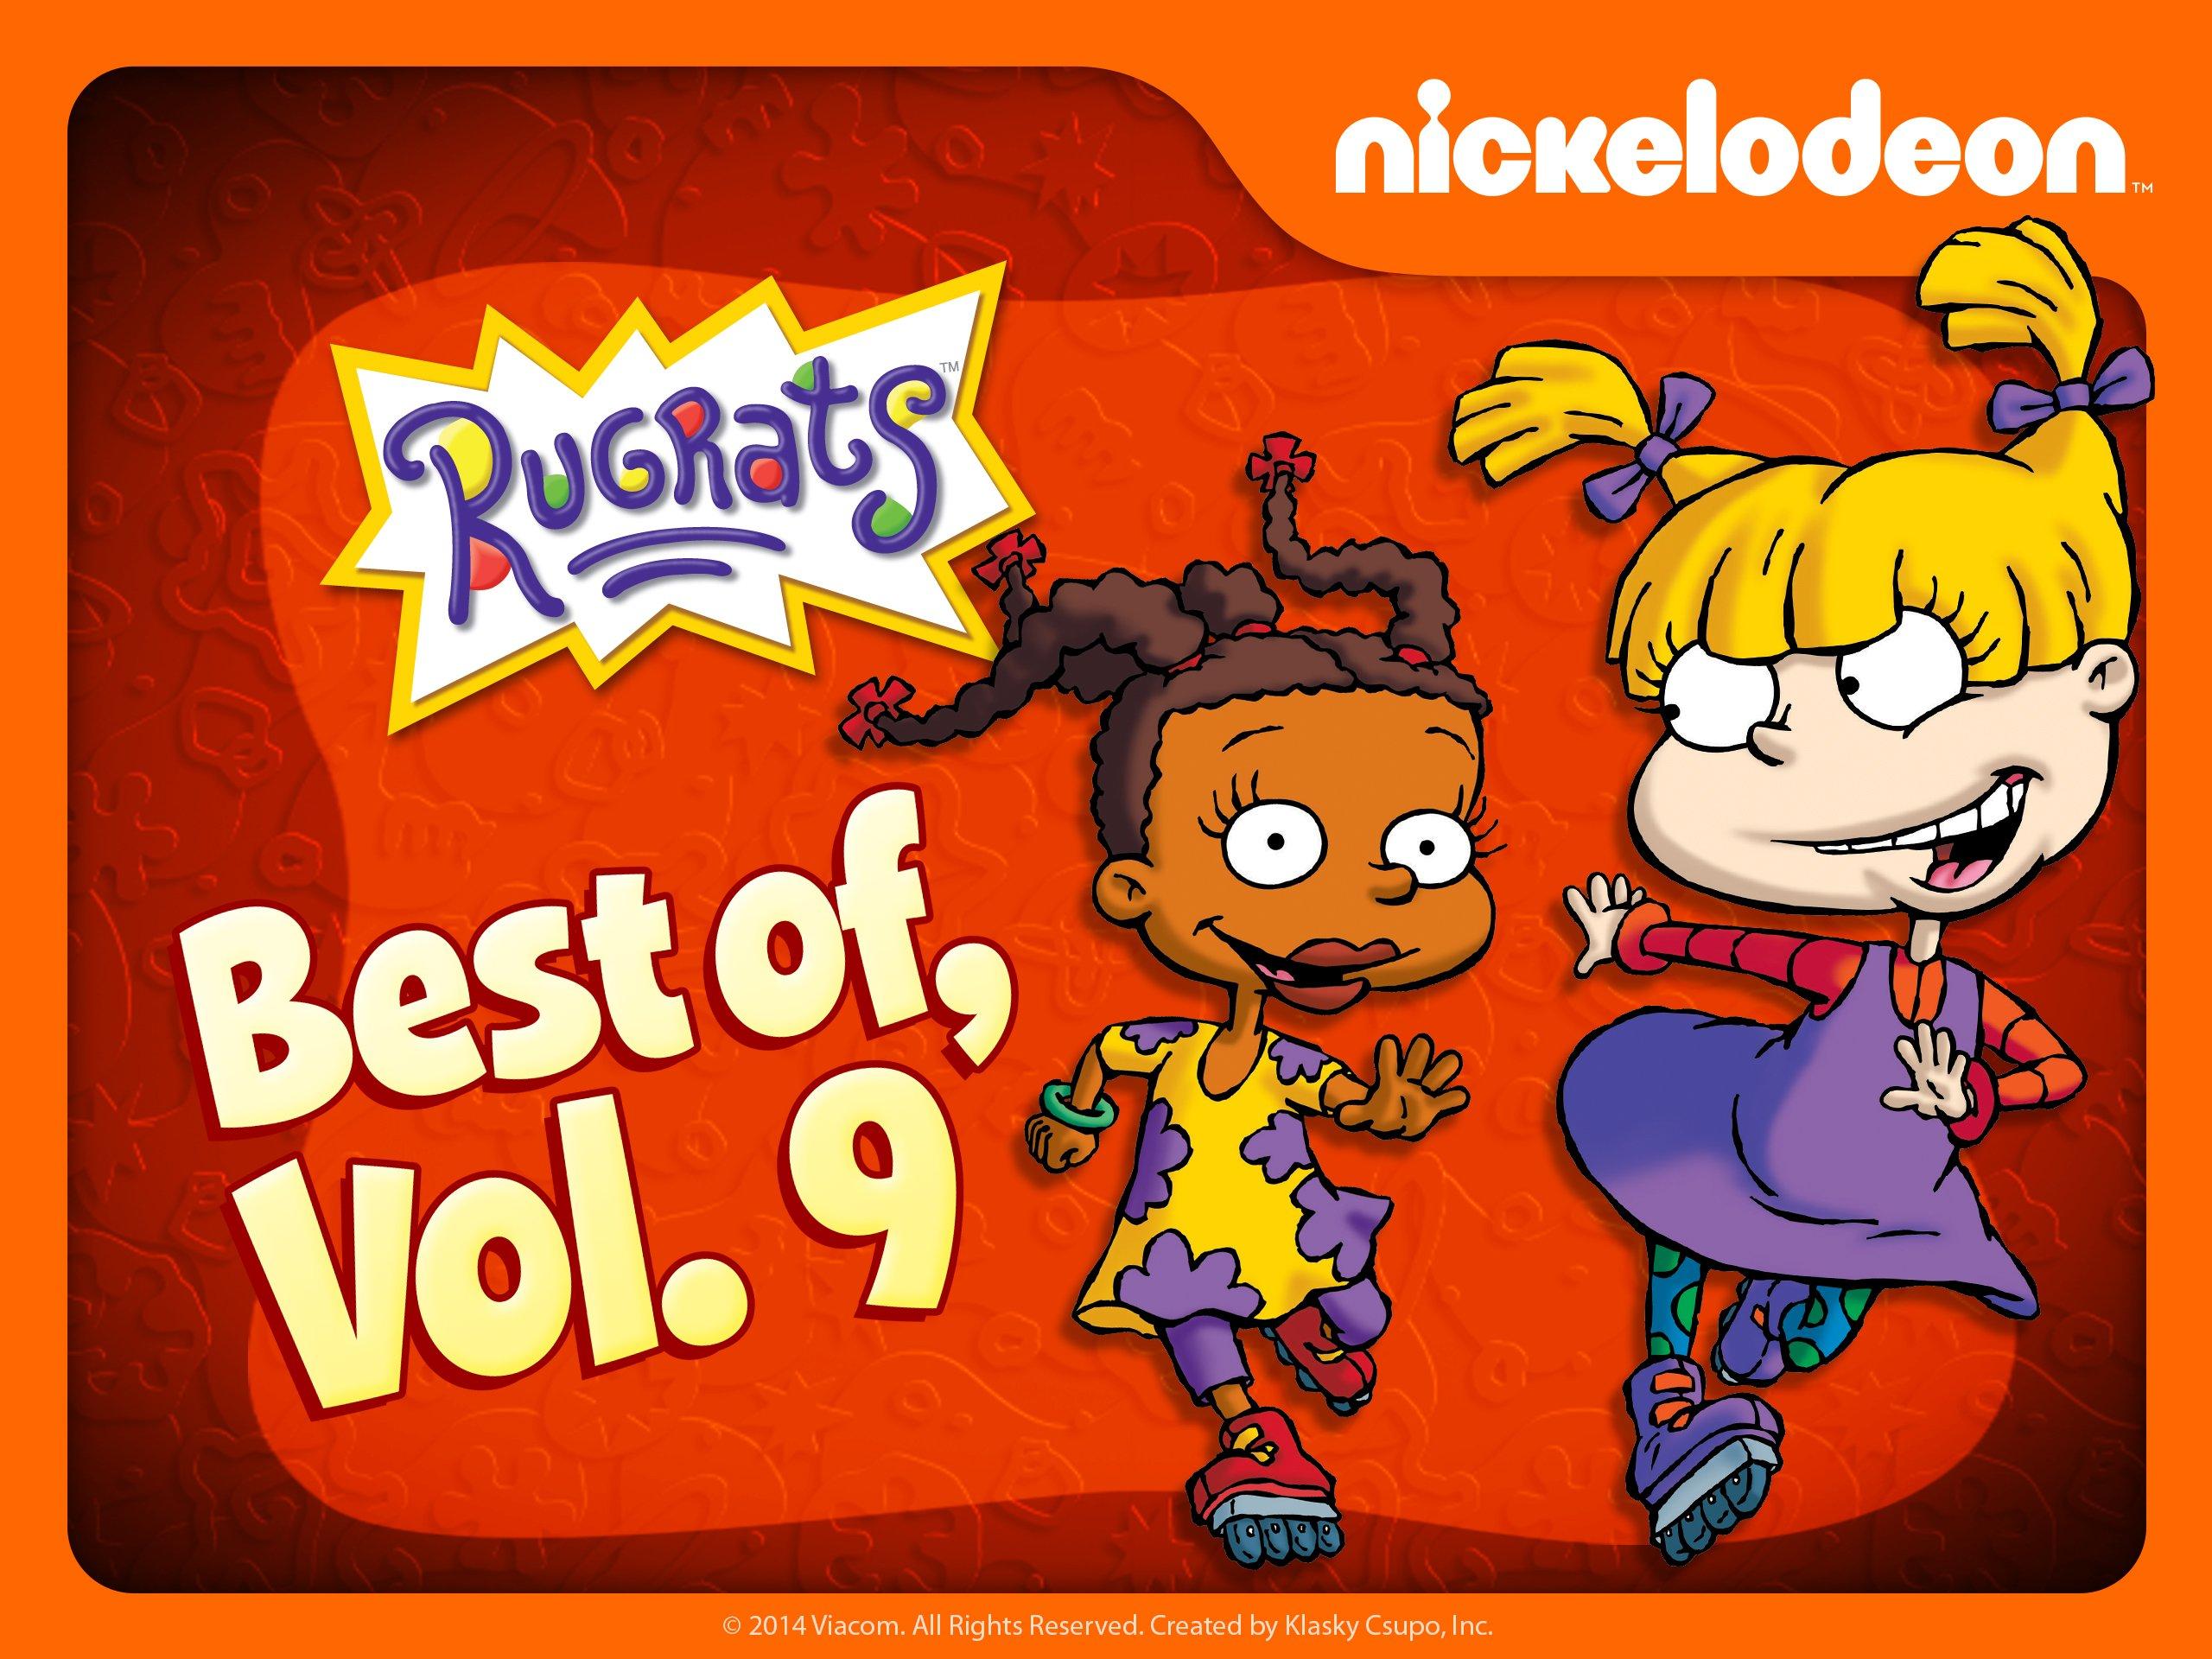 Amazon.co.uk: Watch Rugrats - Season 2 | Prime Video